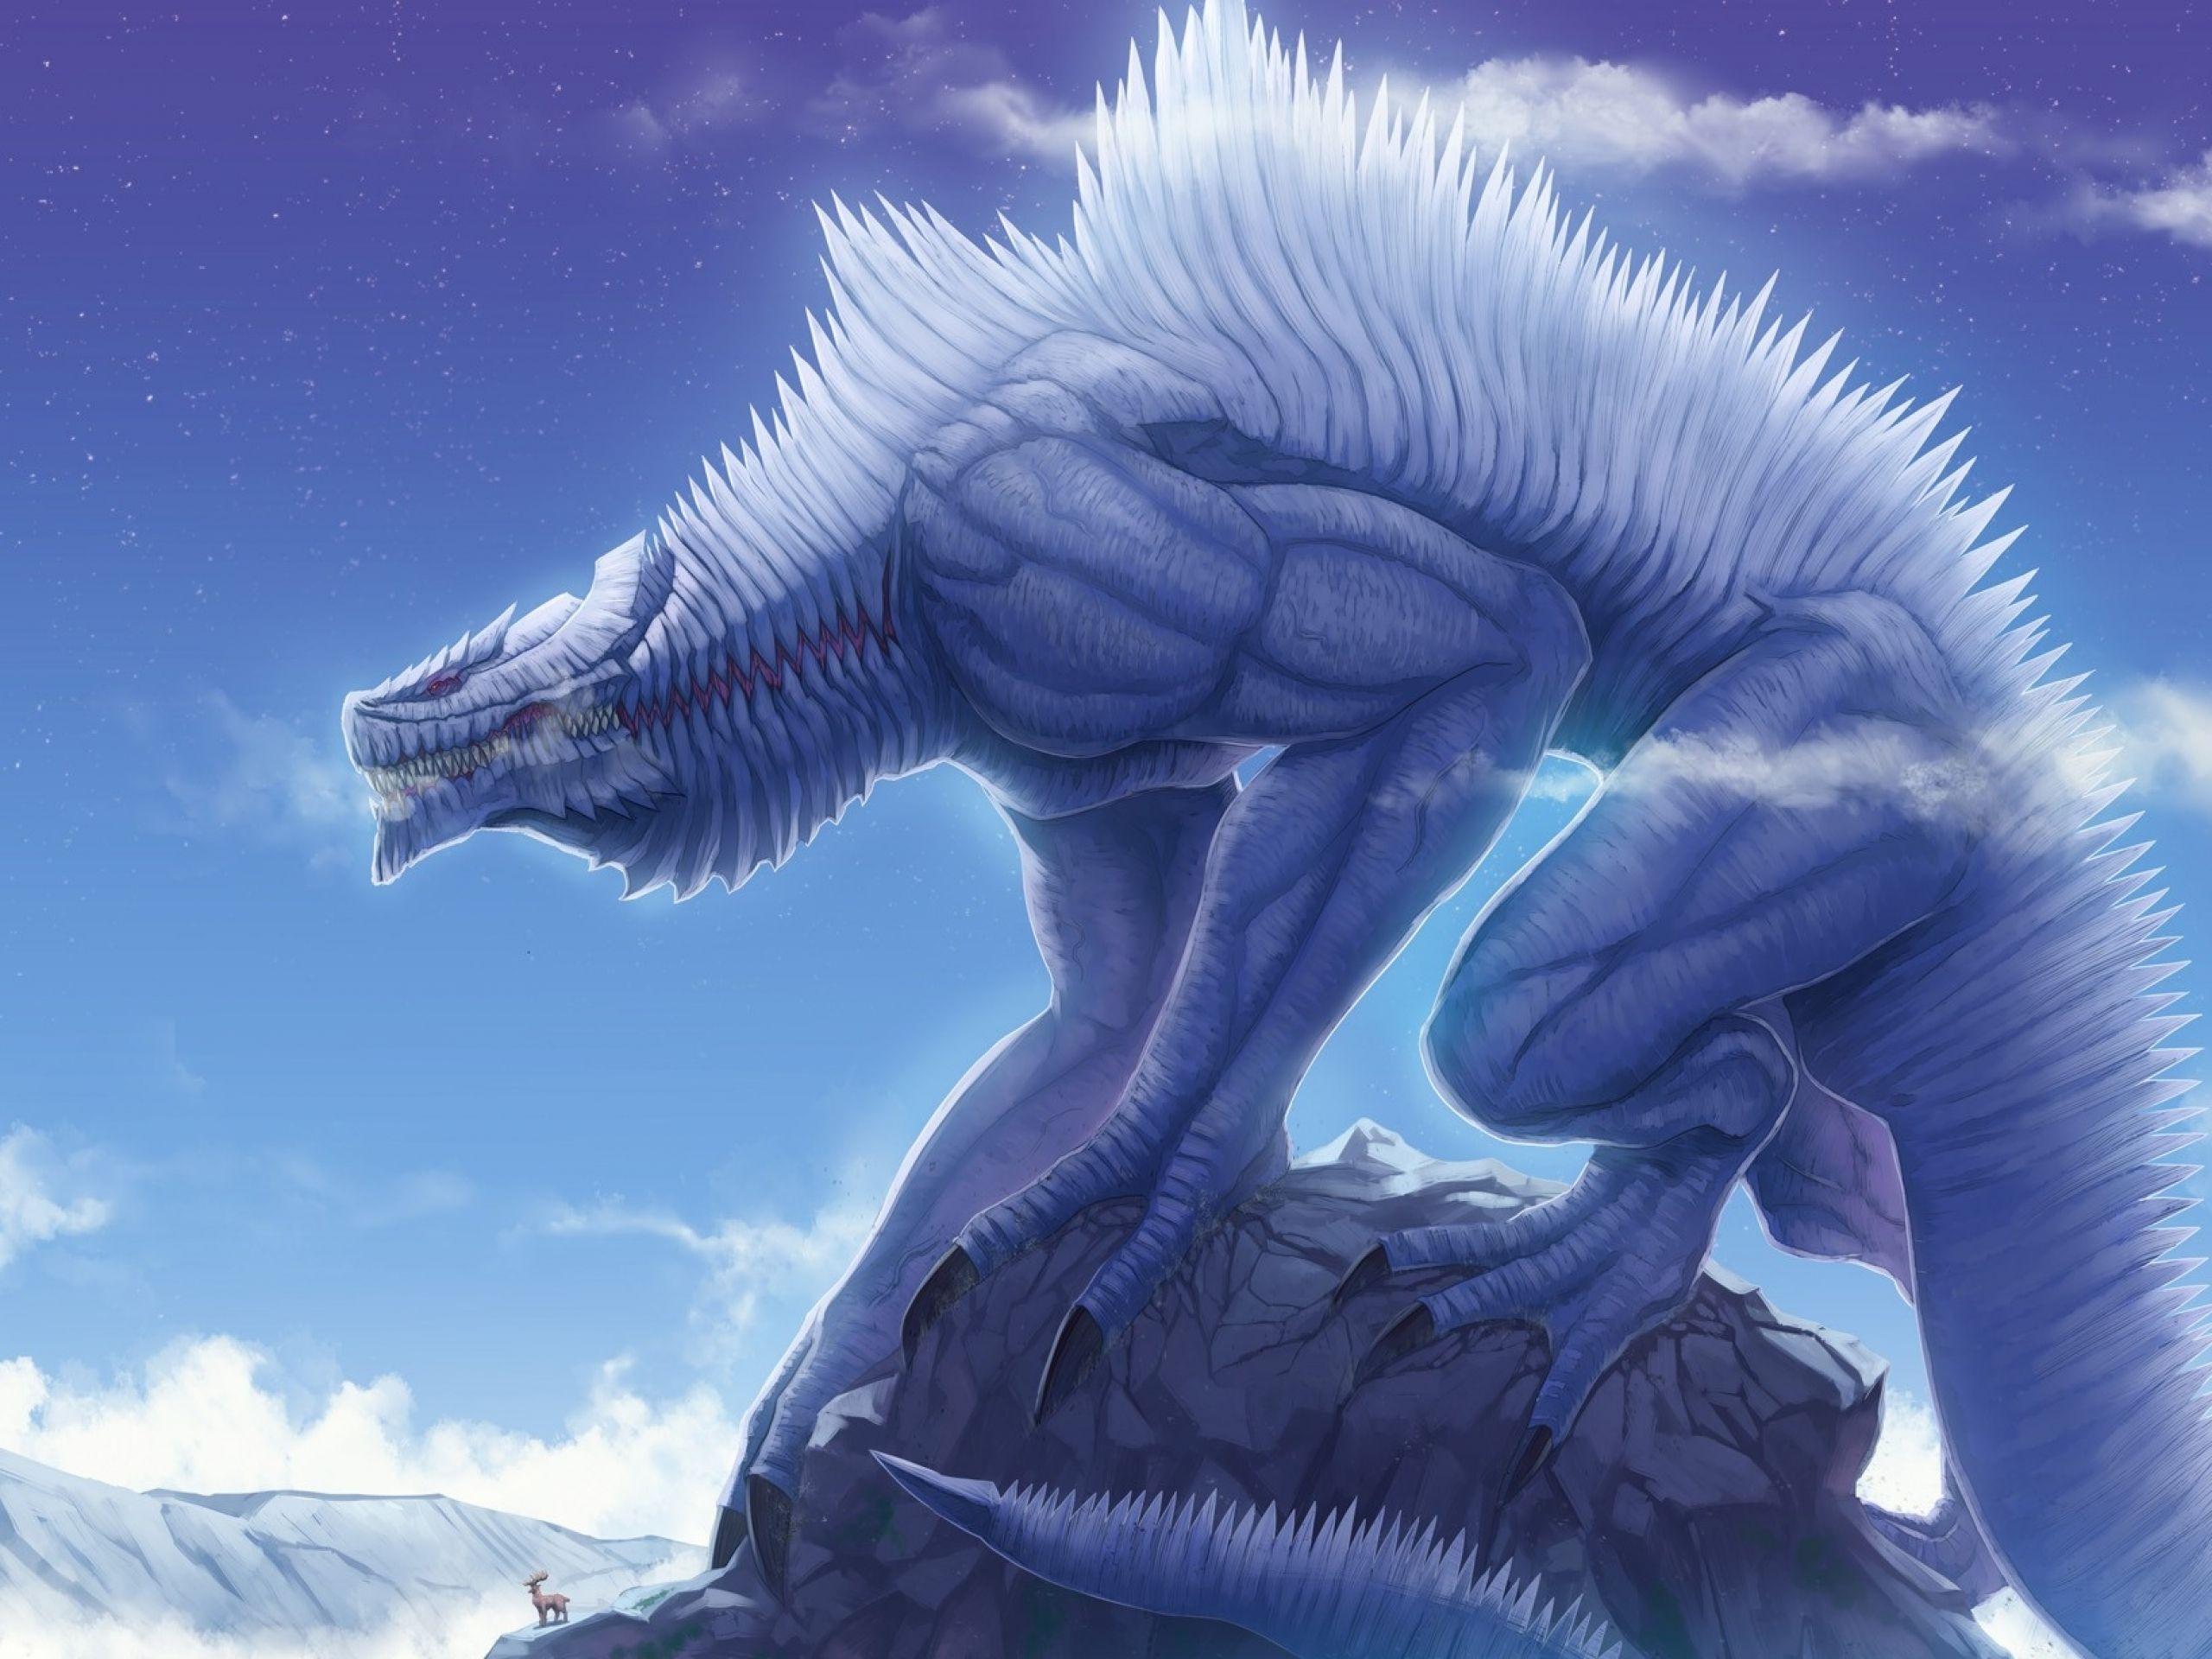 Fantasy Snow Backgrounds Dreamy Fantasy Snow Monster